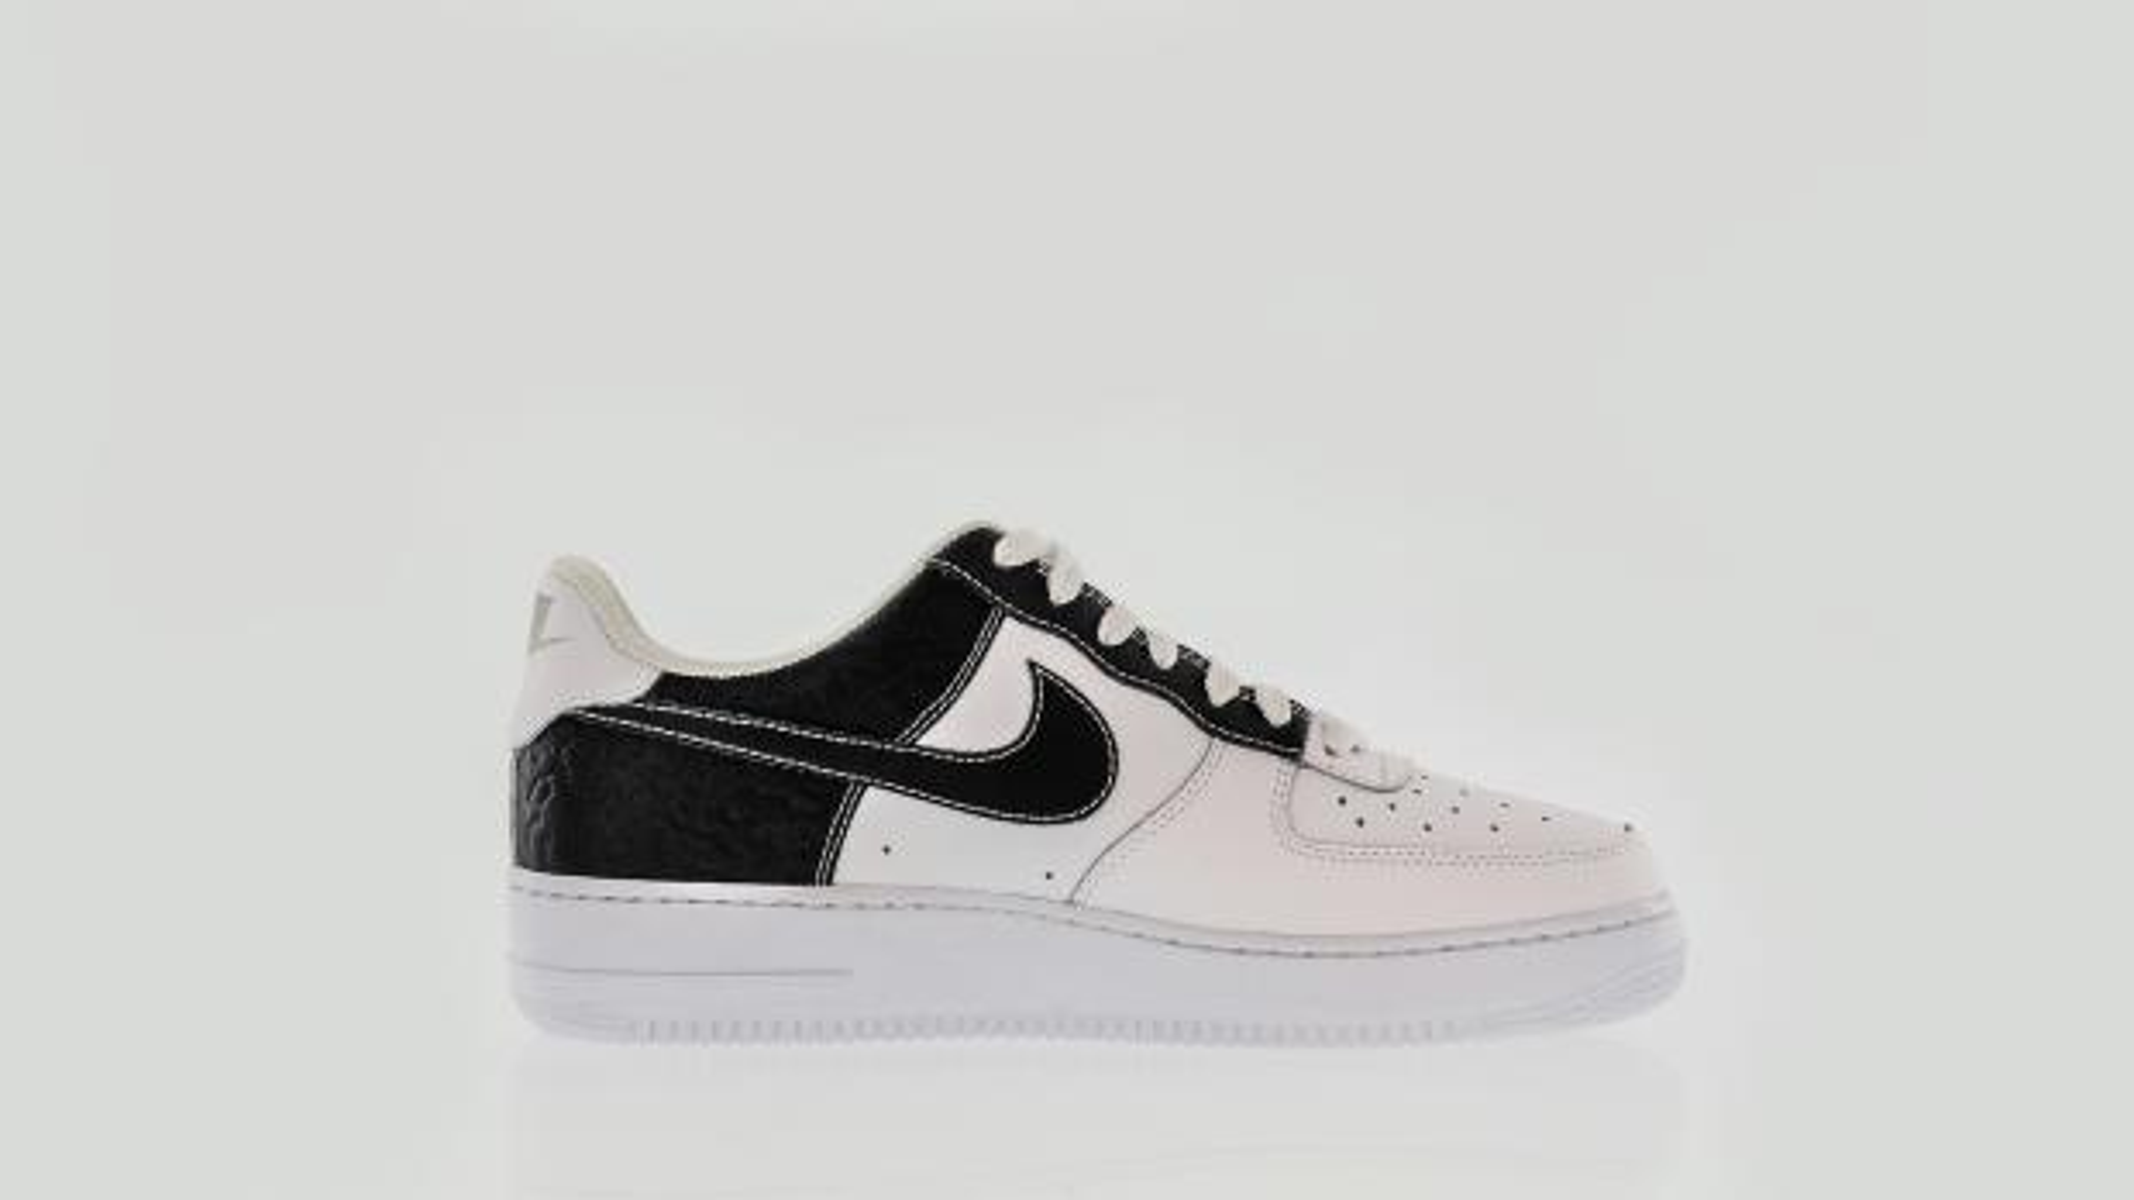 4b26b5a17b06 10. Nike Air Force 1 low